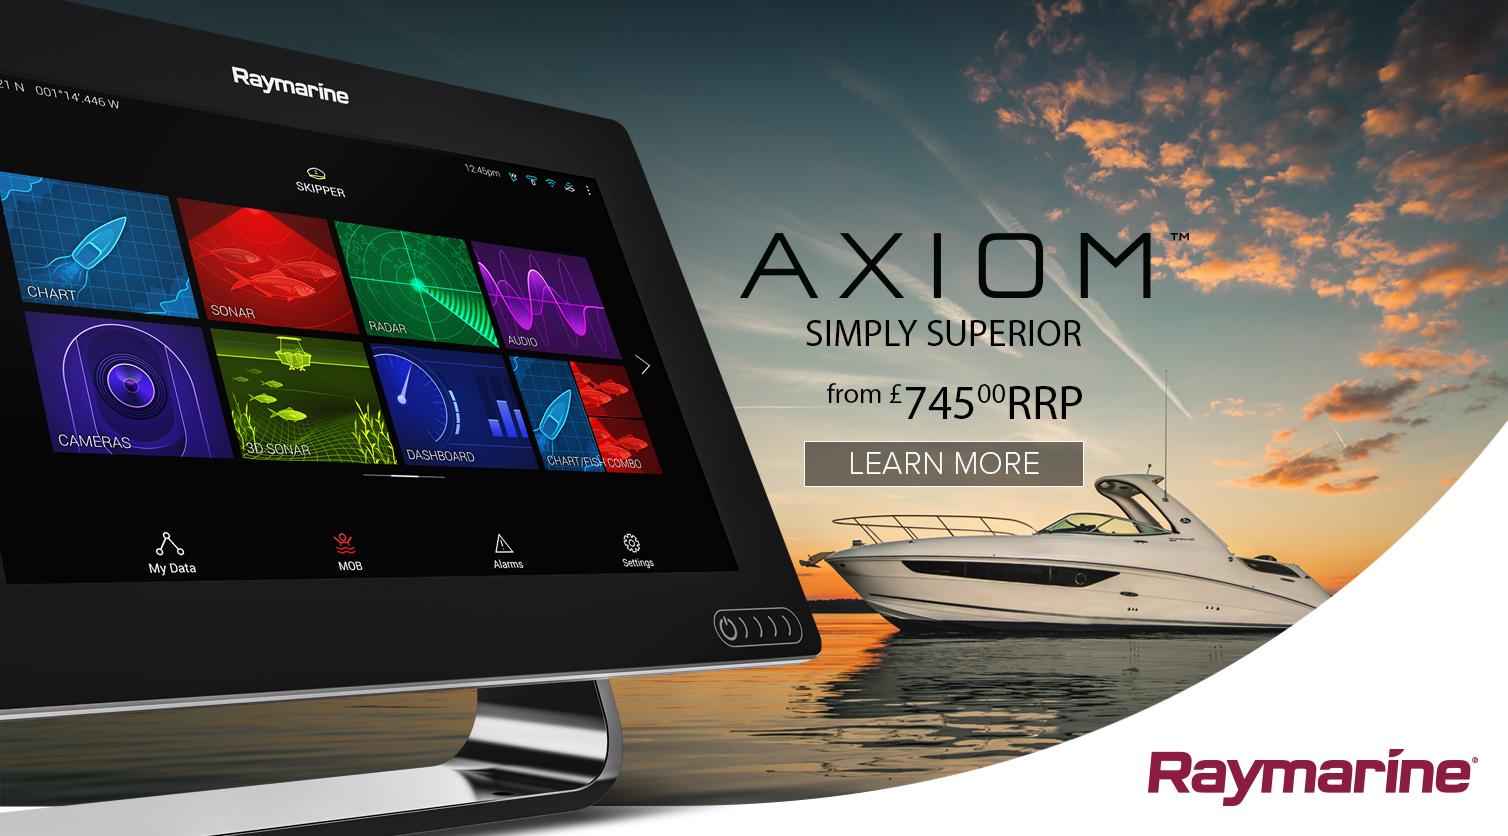 axiom-1508x836-power.jpg